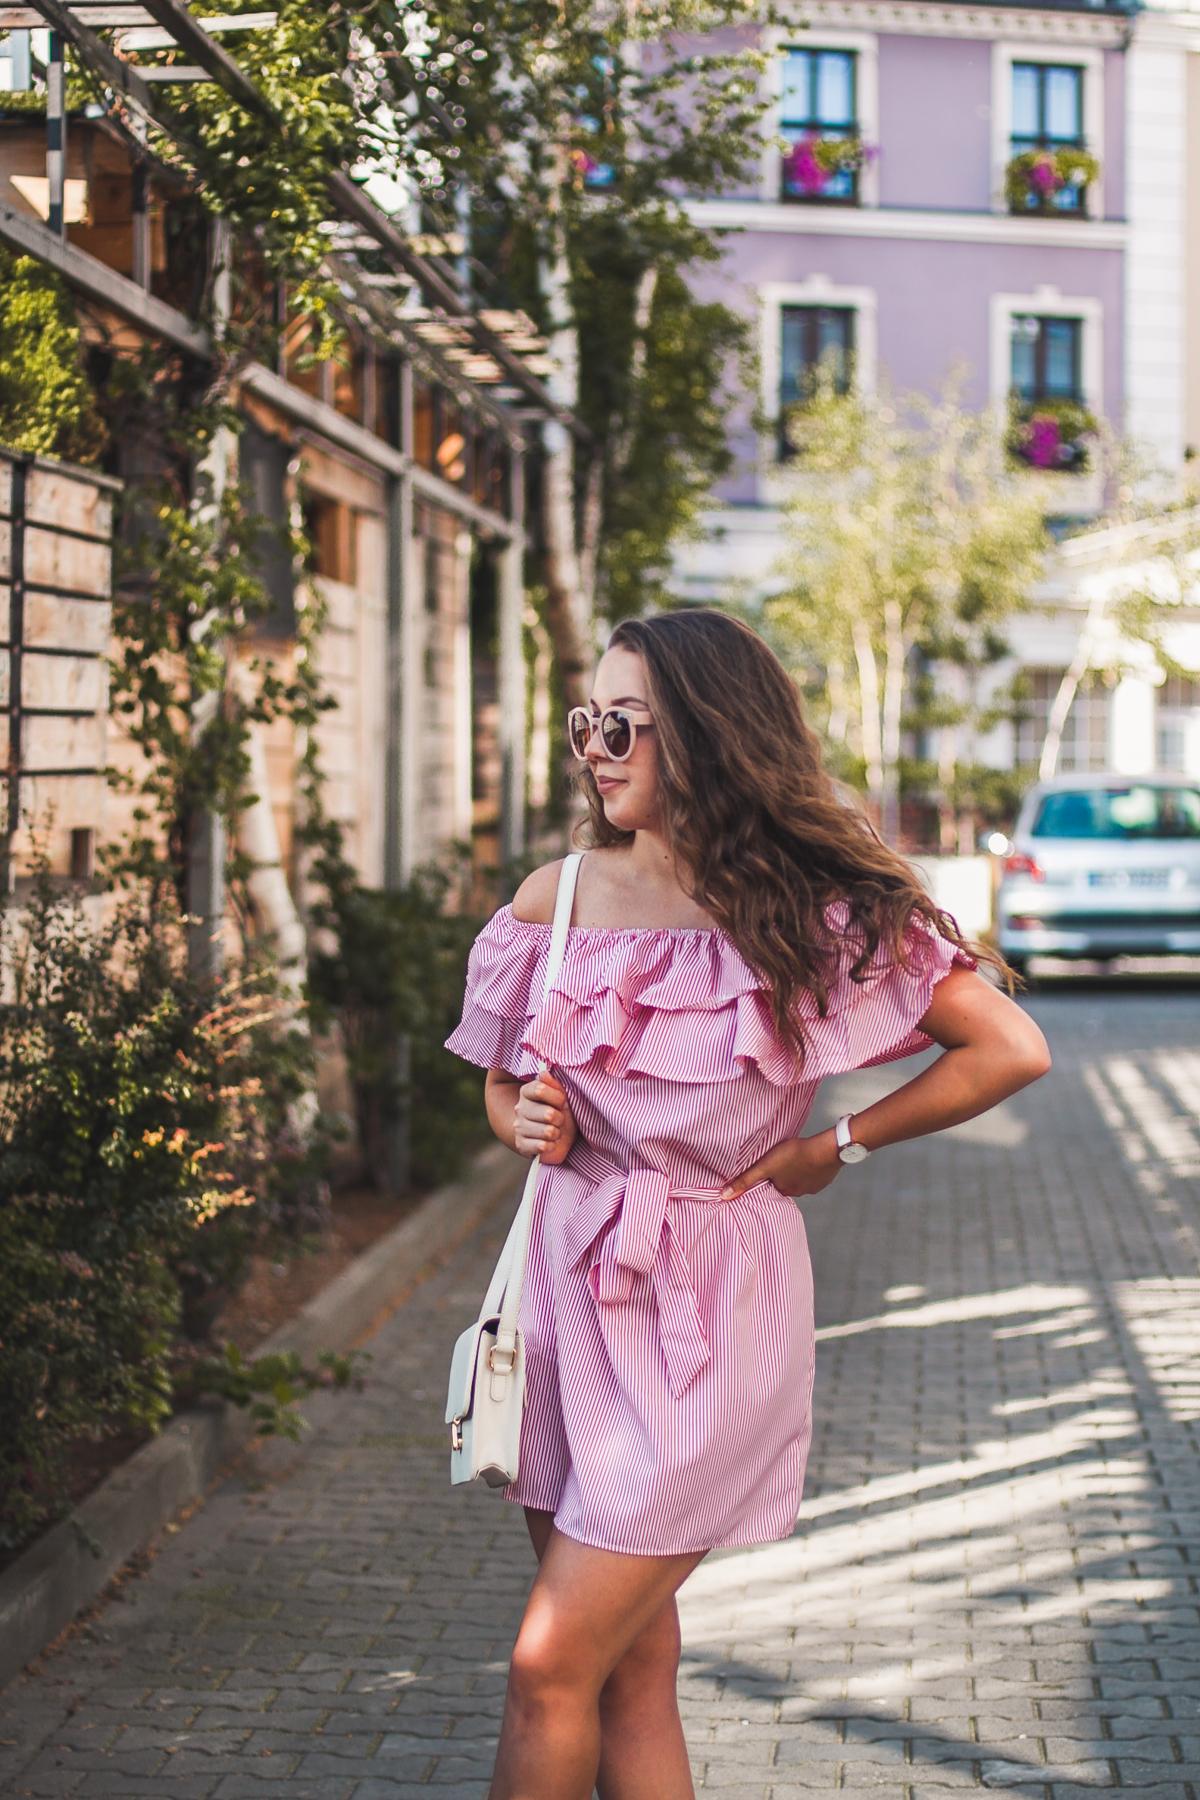 hiszpanka w paski stylizacja blog